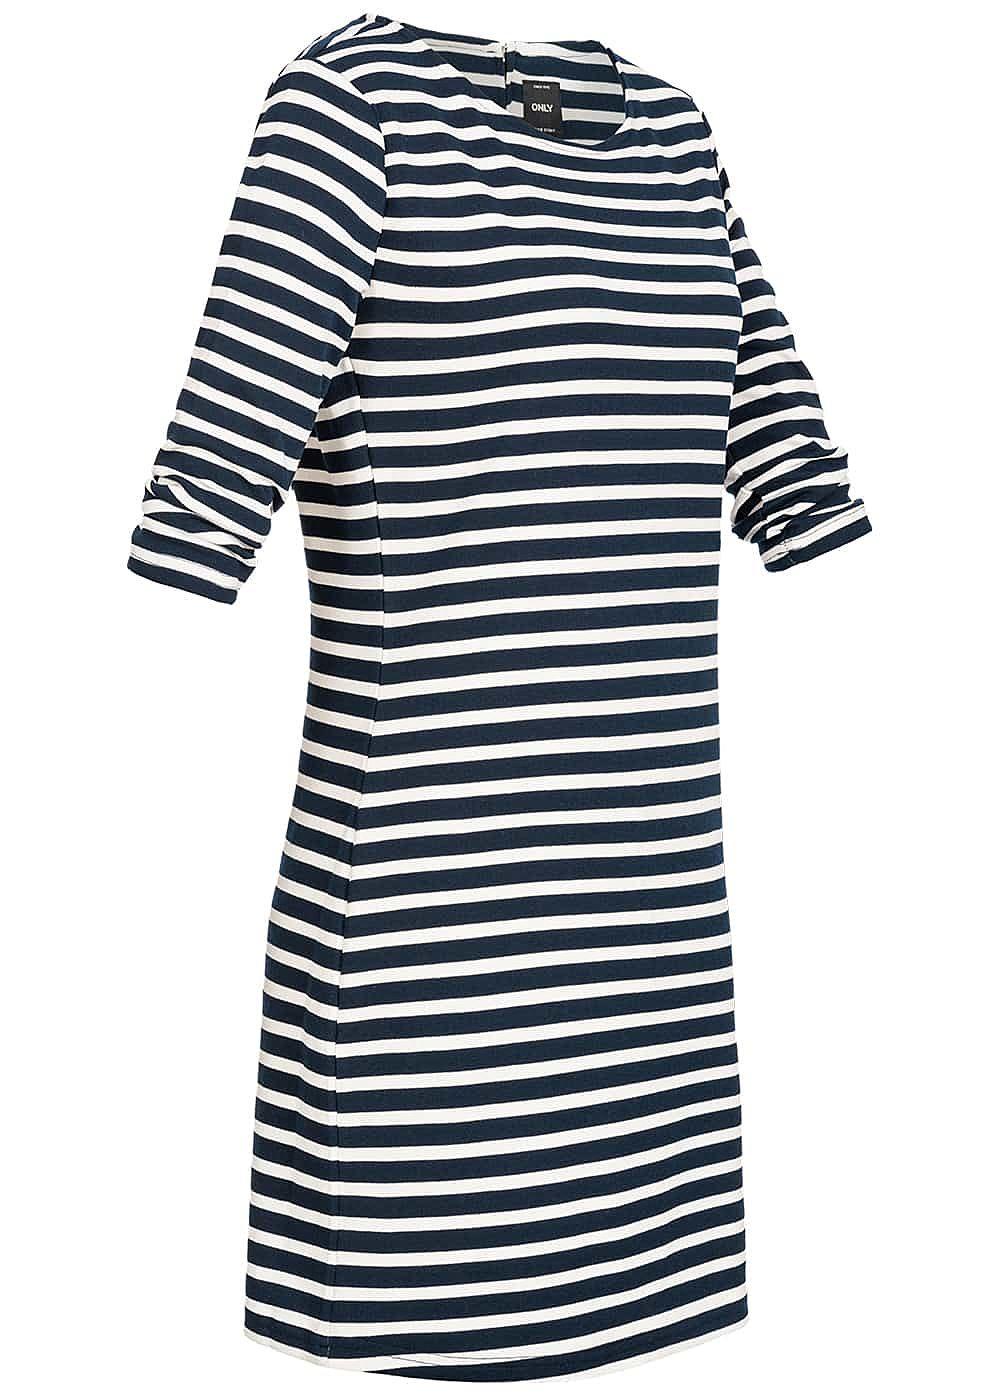 ONLY Damen 3/4 Arm Kleid Streifen Muster NOOS sky captain ...